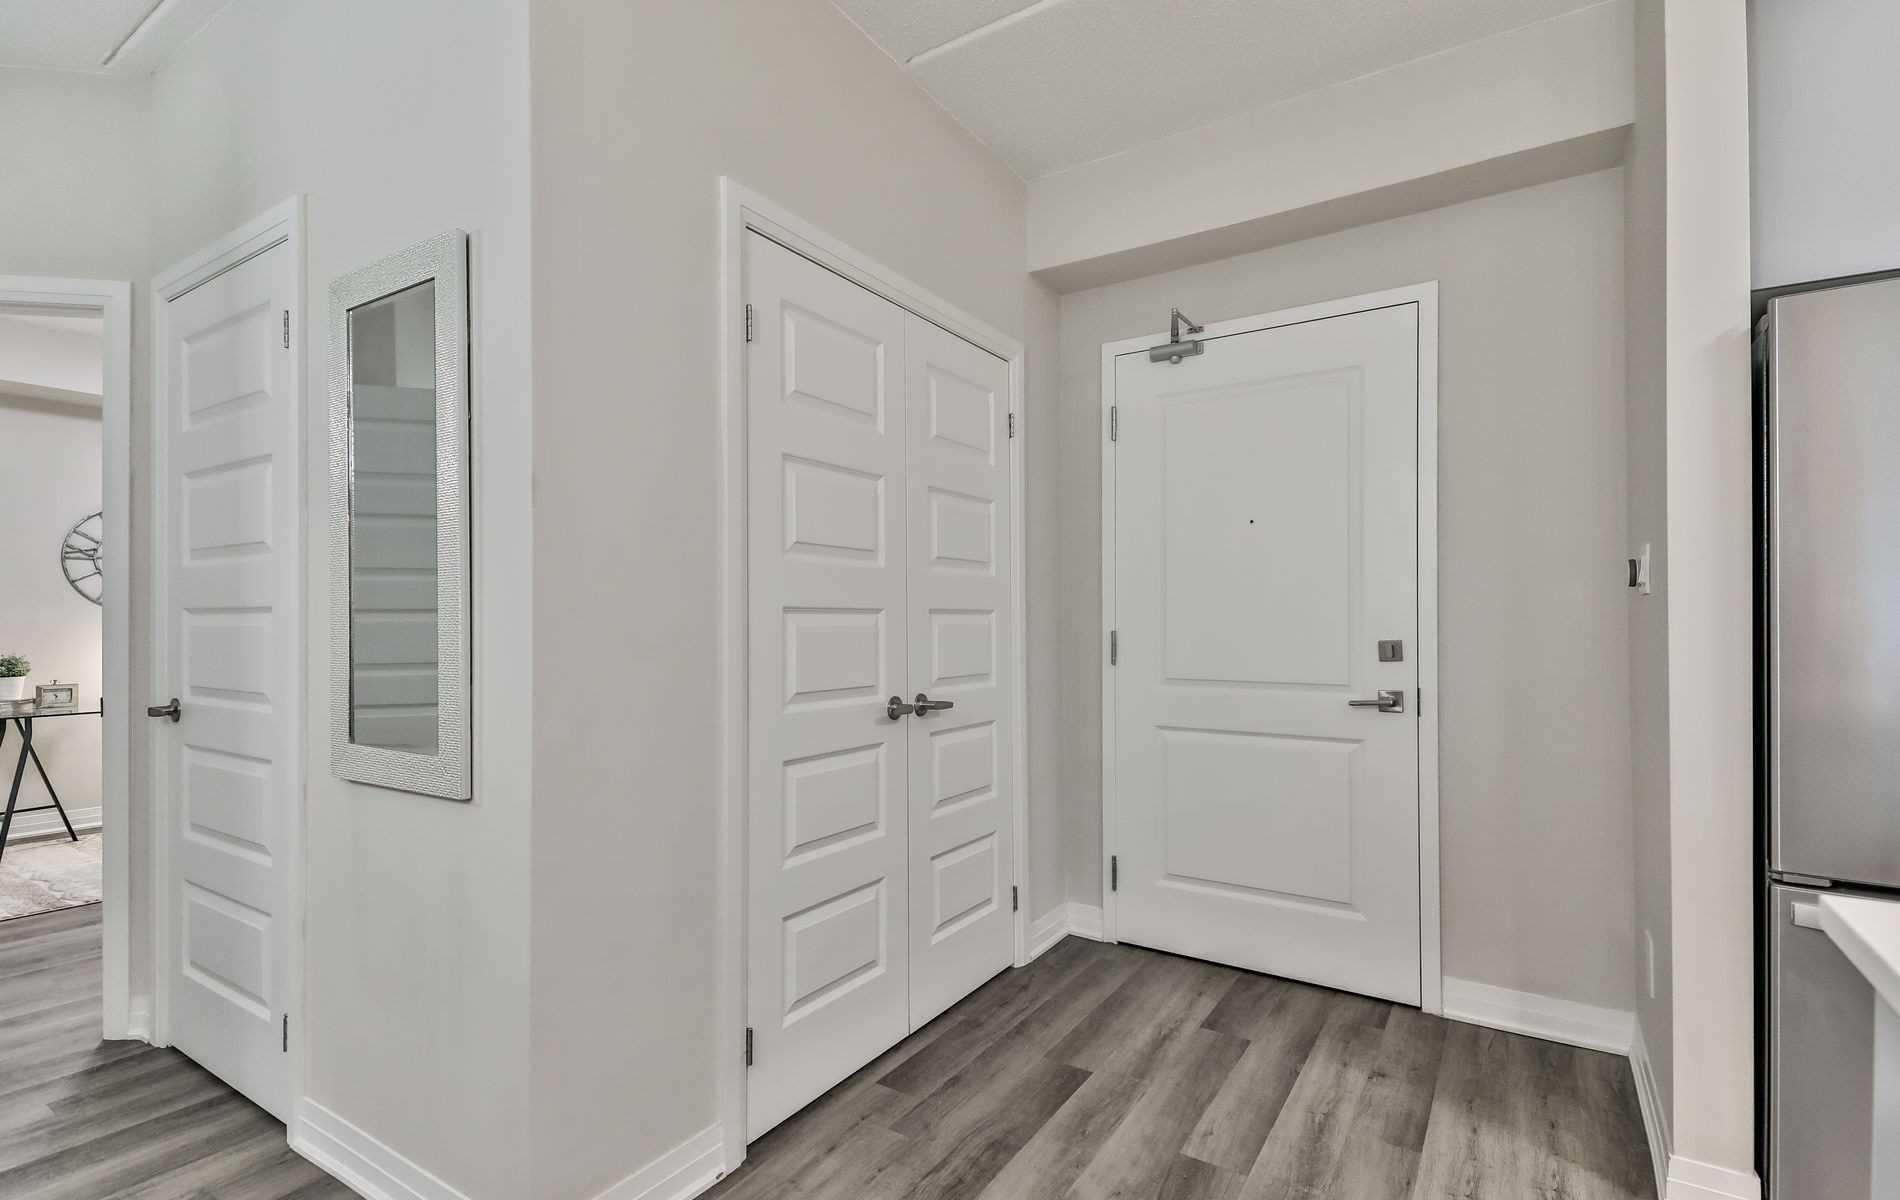 316 - 610 Farmstead Dr - Willmont Condo Apt for sale, 2 Bedrooms (W5399854) - #5